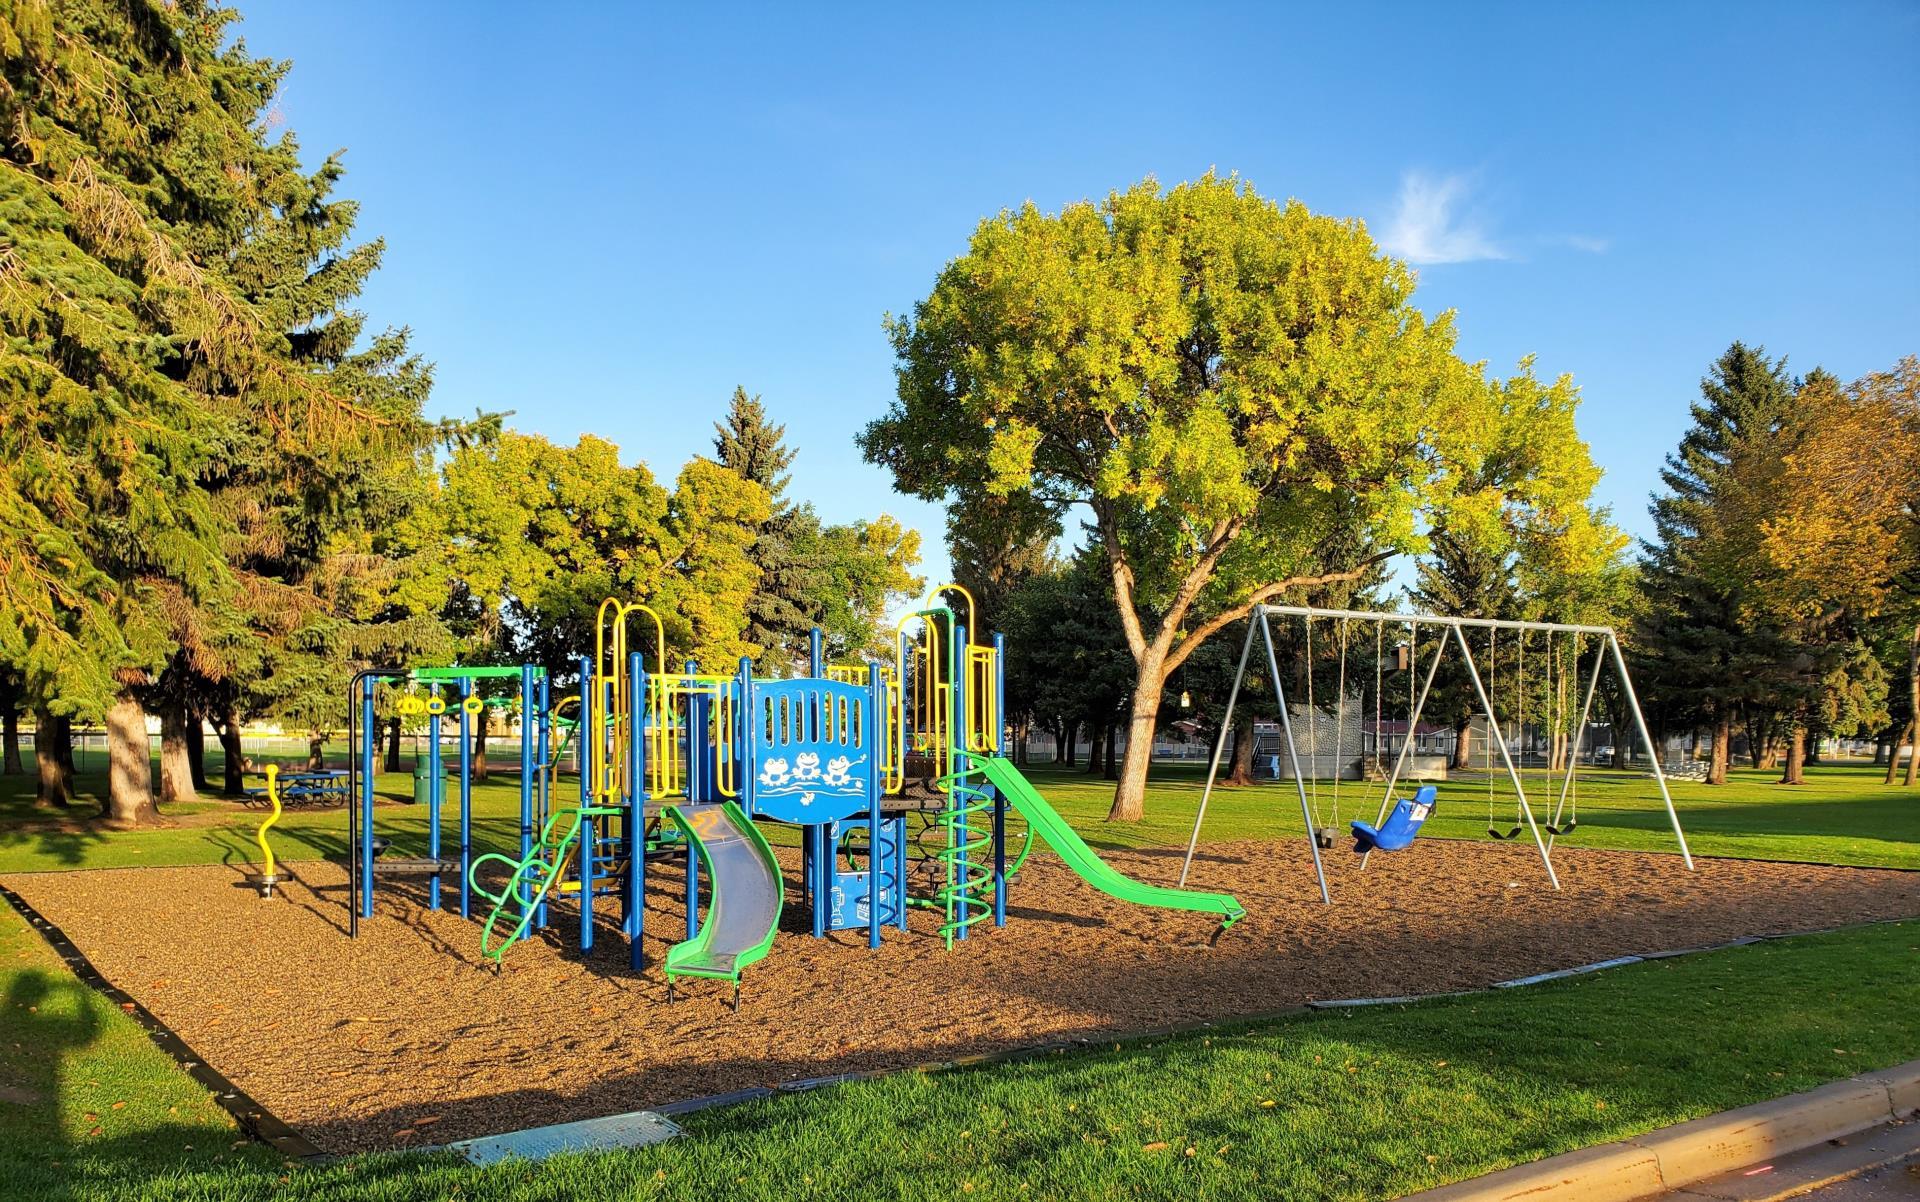 Confederation Park Playground